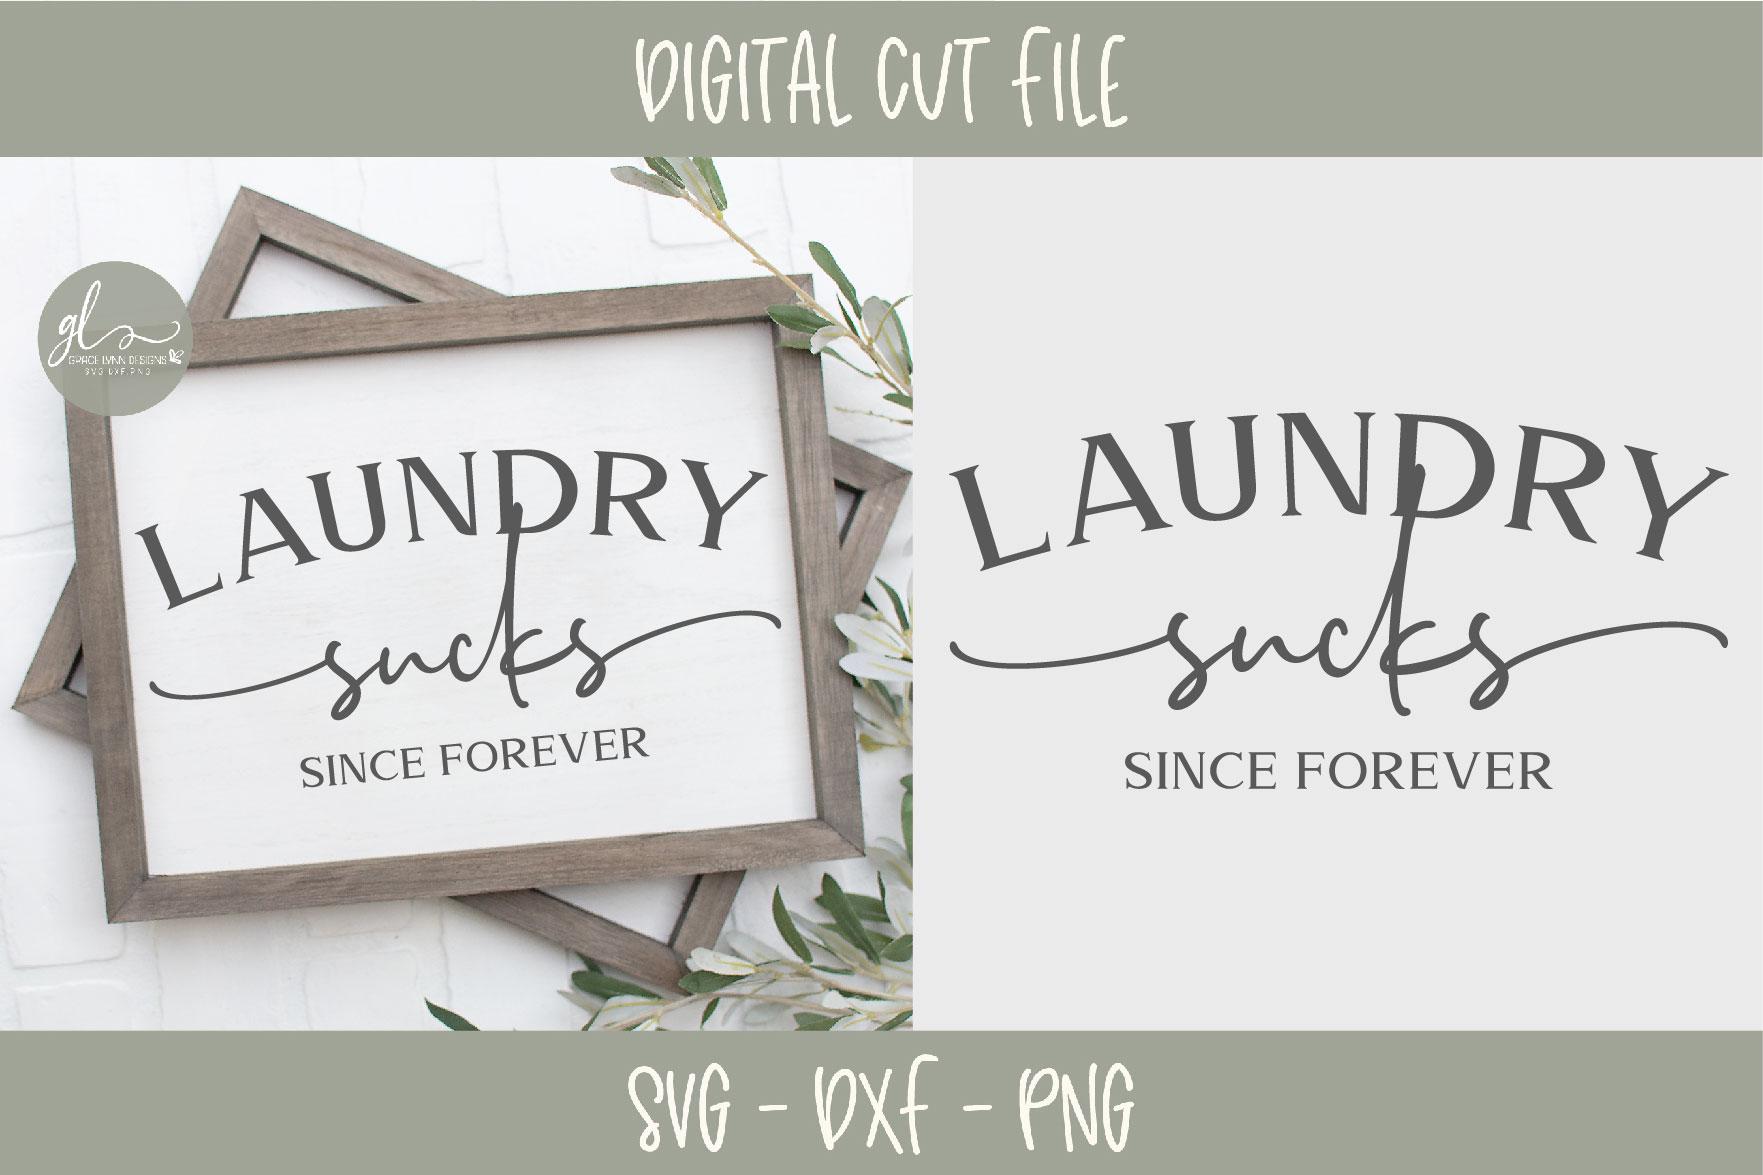 Laundry Sign Bundle - 20 Designs - SVG Cut Files example image 3